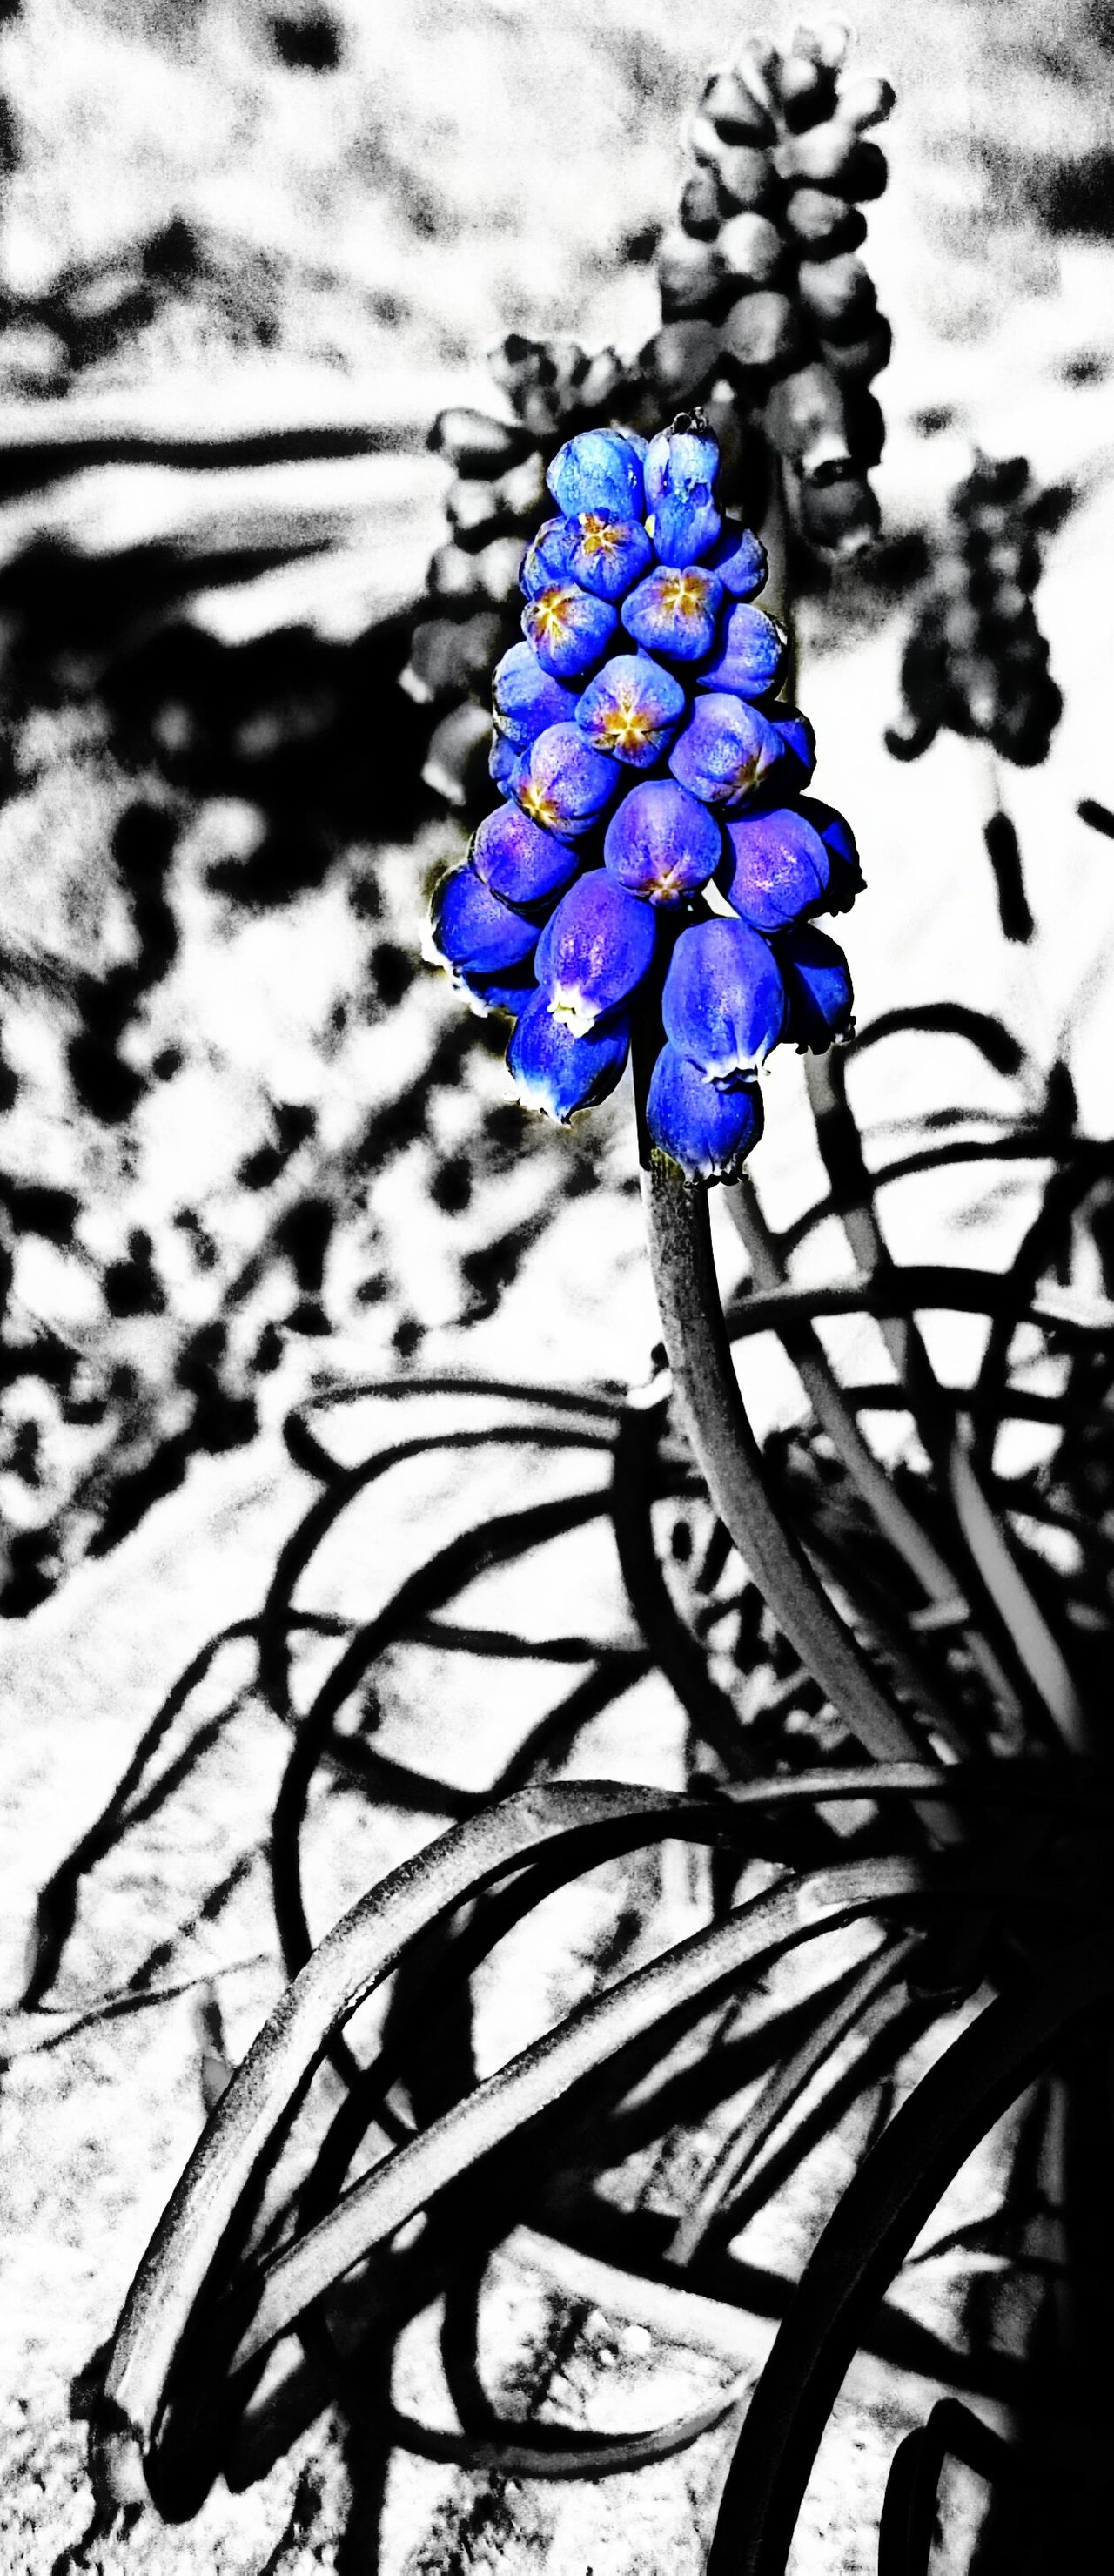 KSMITH22 Edited Nature Beauty In Nature Black Background Colorsplash Close-up Calm Flower Photography EyeEm EyeEm Nature Lover Eyeem Market EyeEm Flower